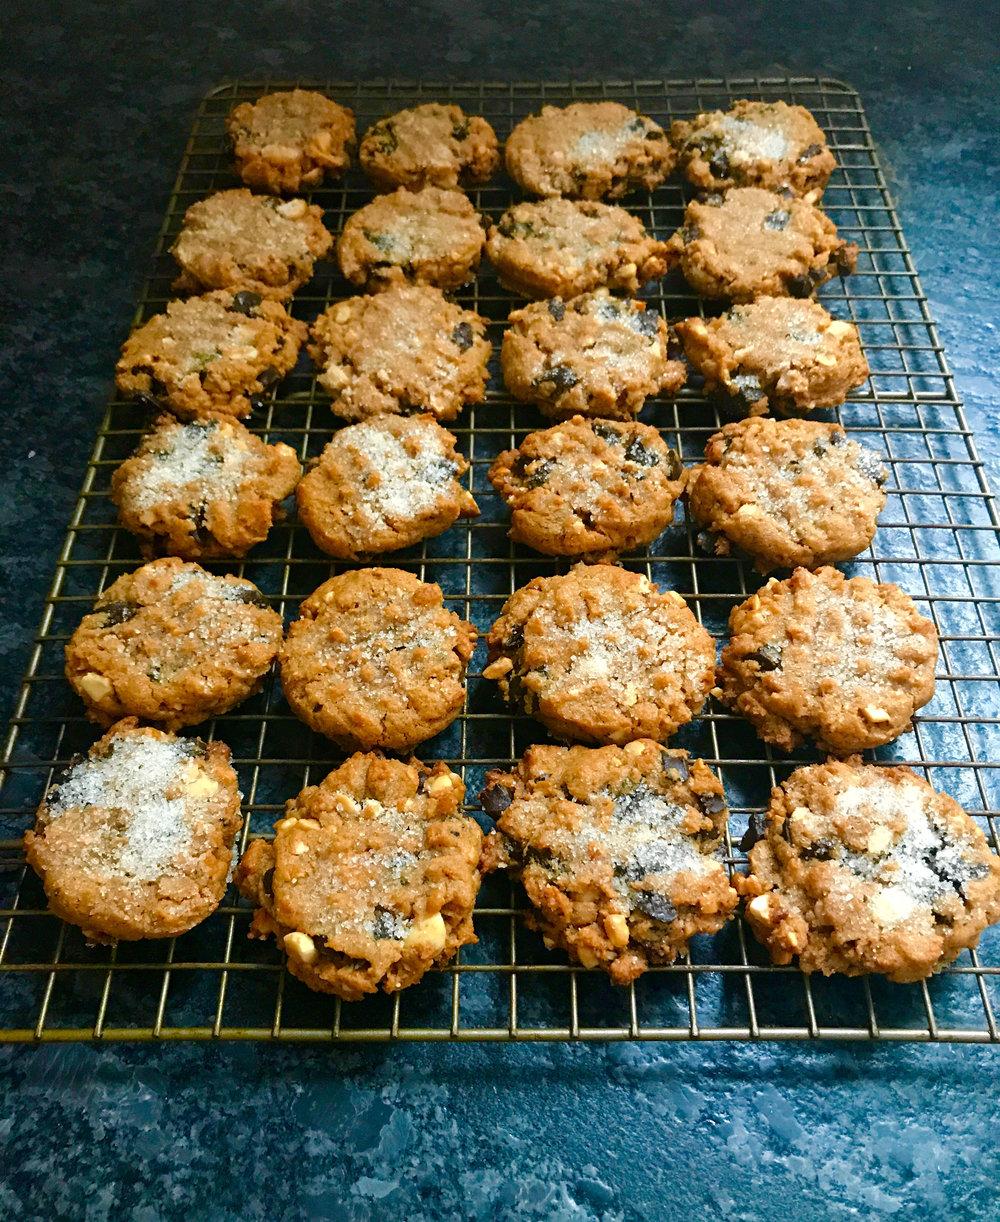 perfectpeanutbutterchocolatechunkcookies.jpg